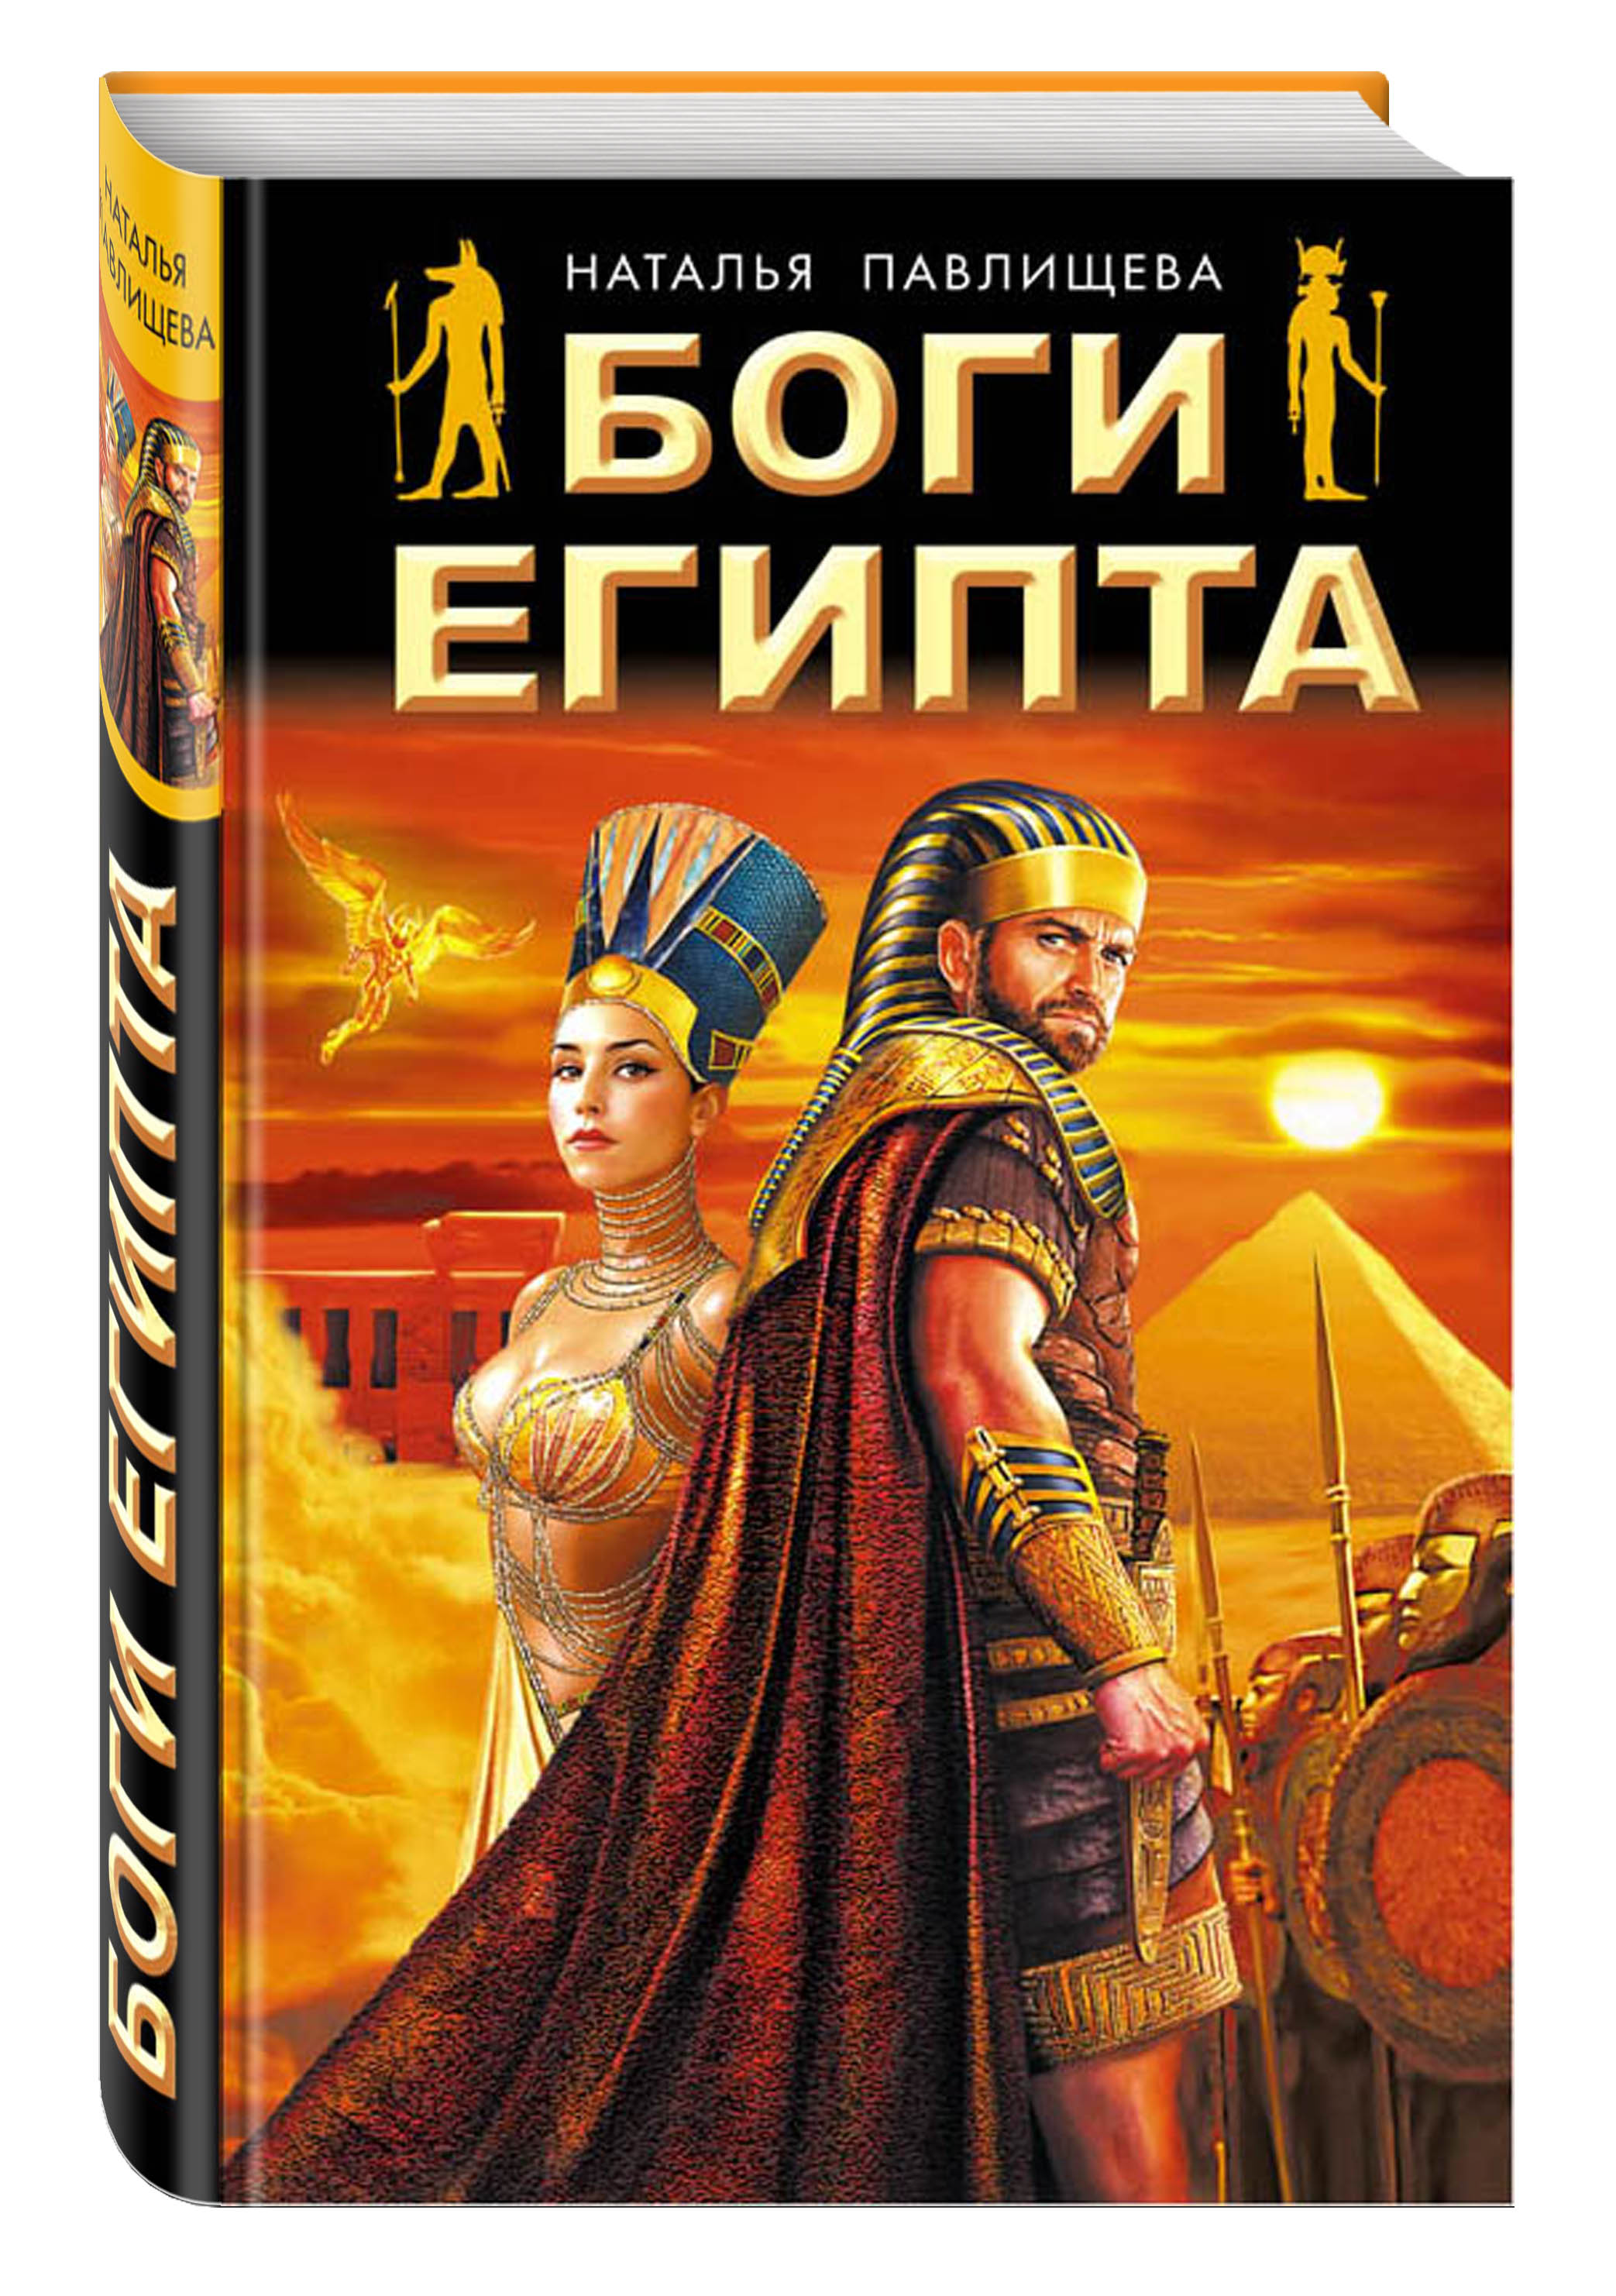 Павлищева Н.П. Боги Египта александр сухов тайные боги земли